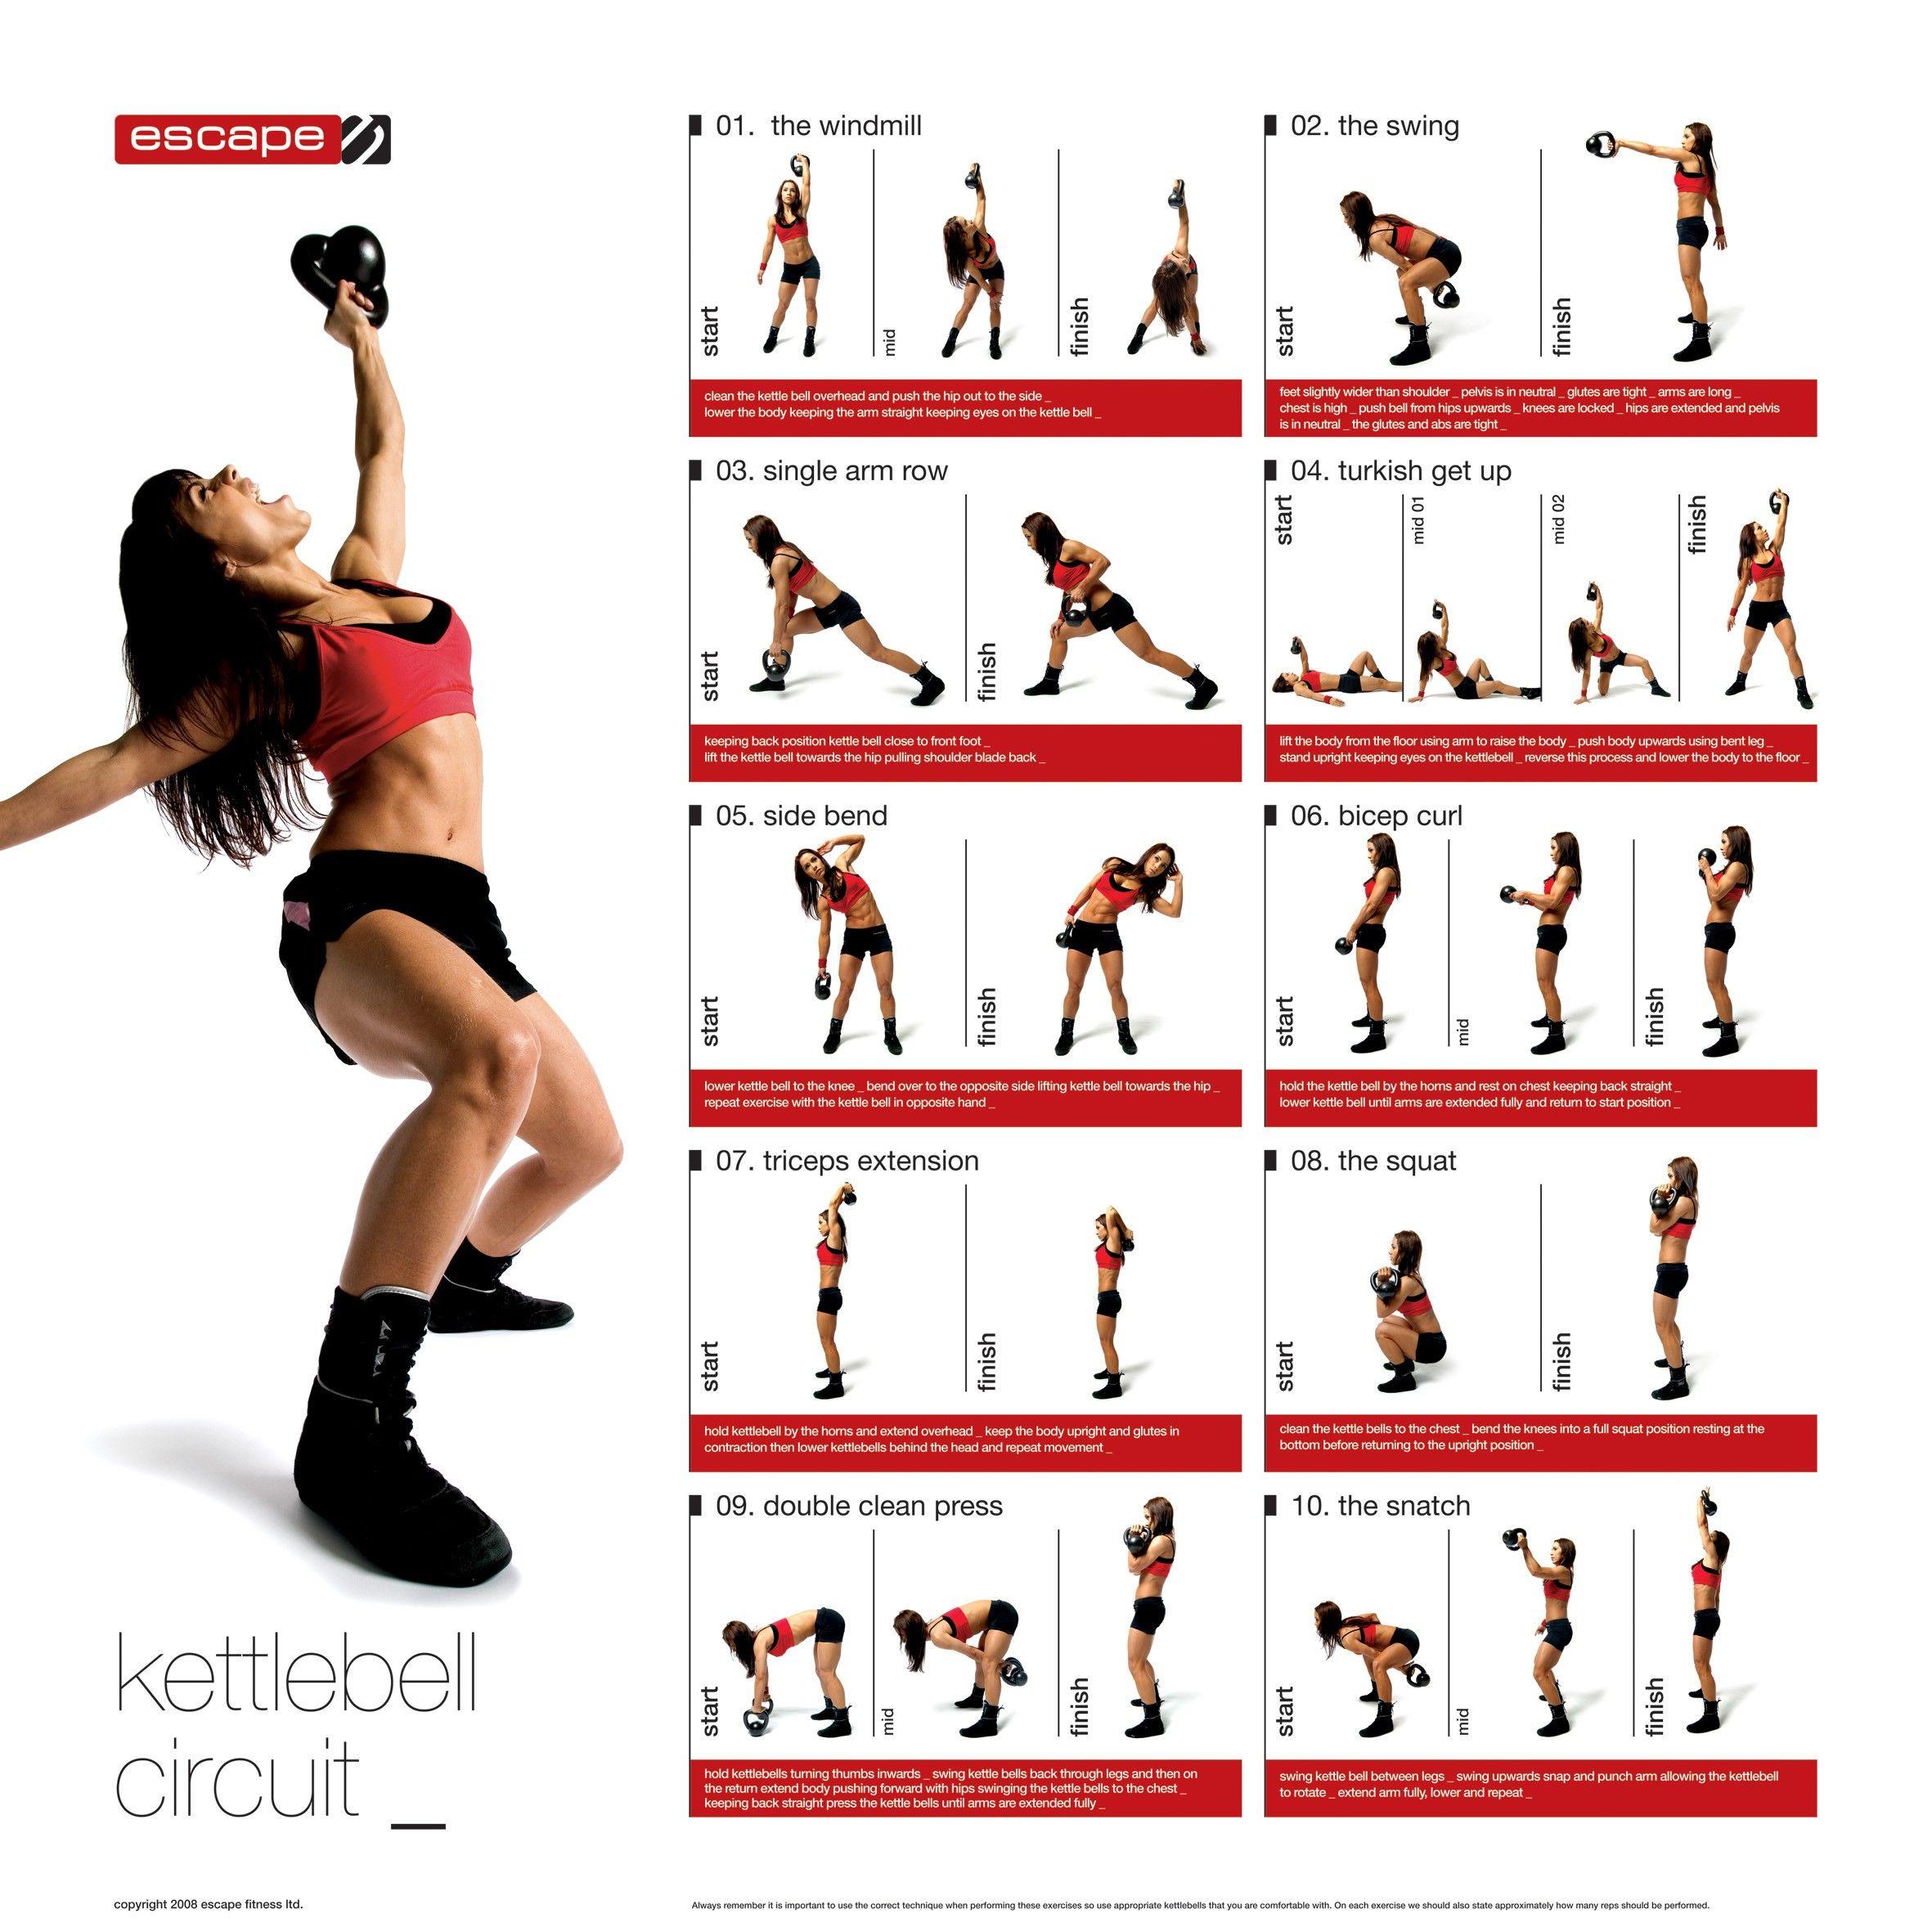 Kettlebell Workout Dvds Kettlebell Fitness Training Dvd: Allenarsi Con Il Kettlebell: Cos'è E Come Si Usa